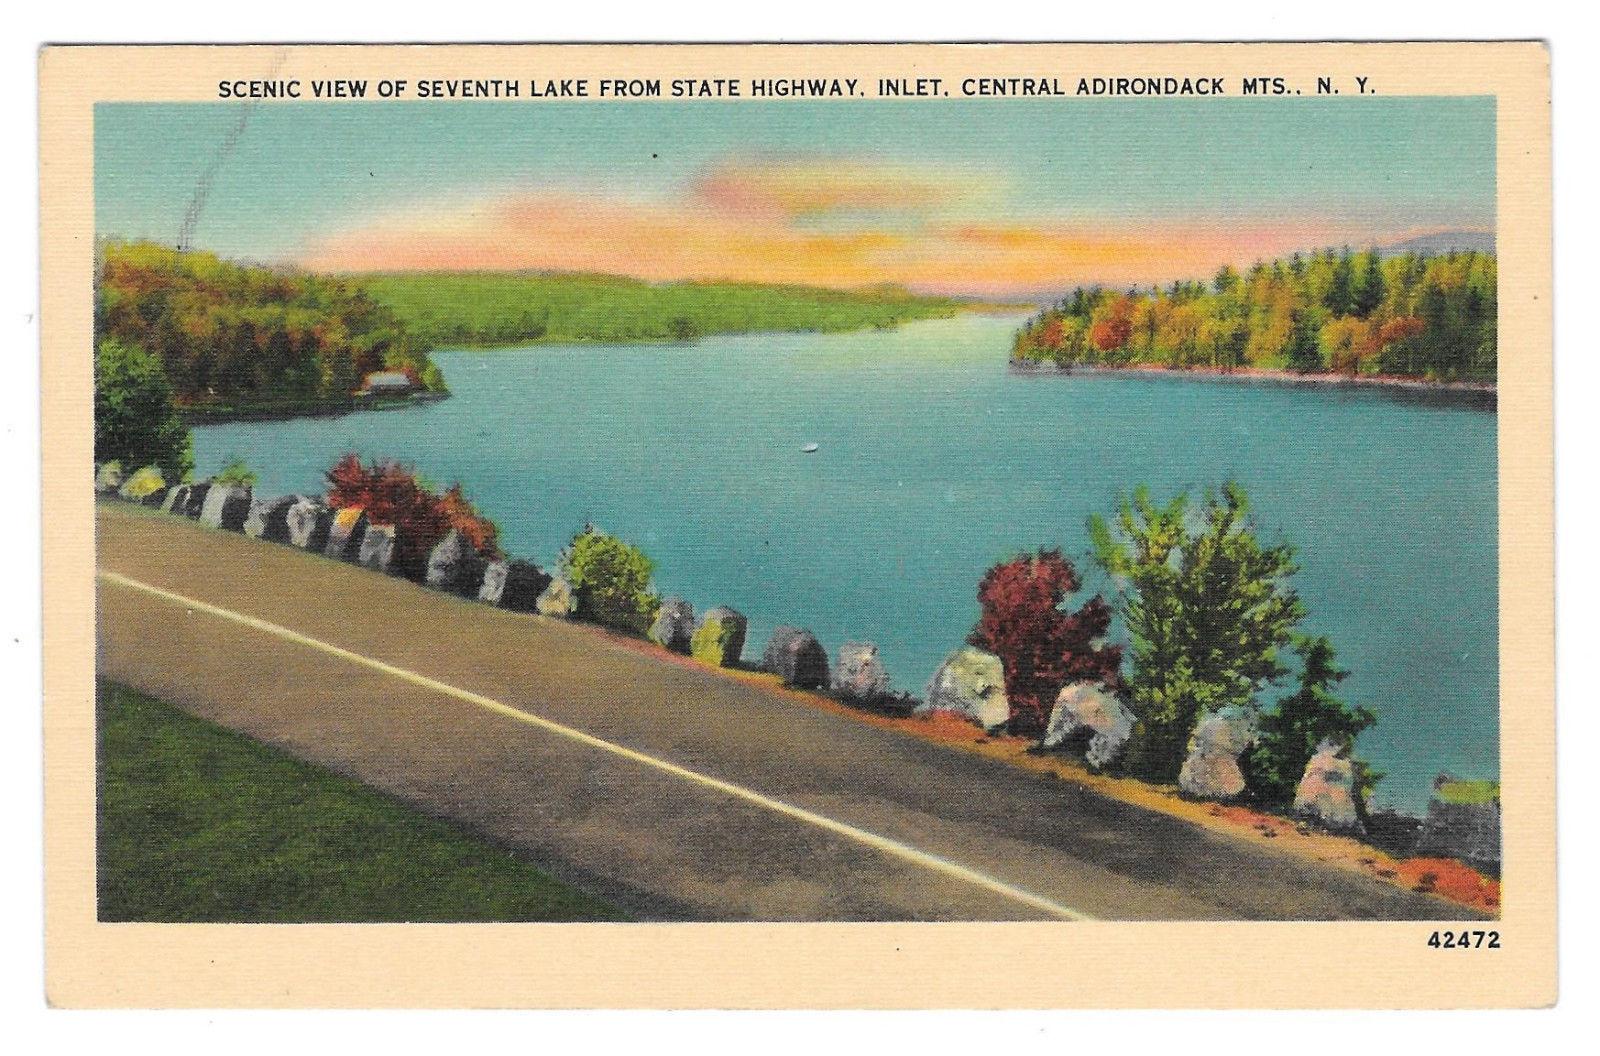 NY Adirondacks Seventh Lake from Highway Inlet Vtg Jubb Postcard